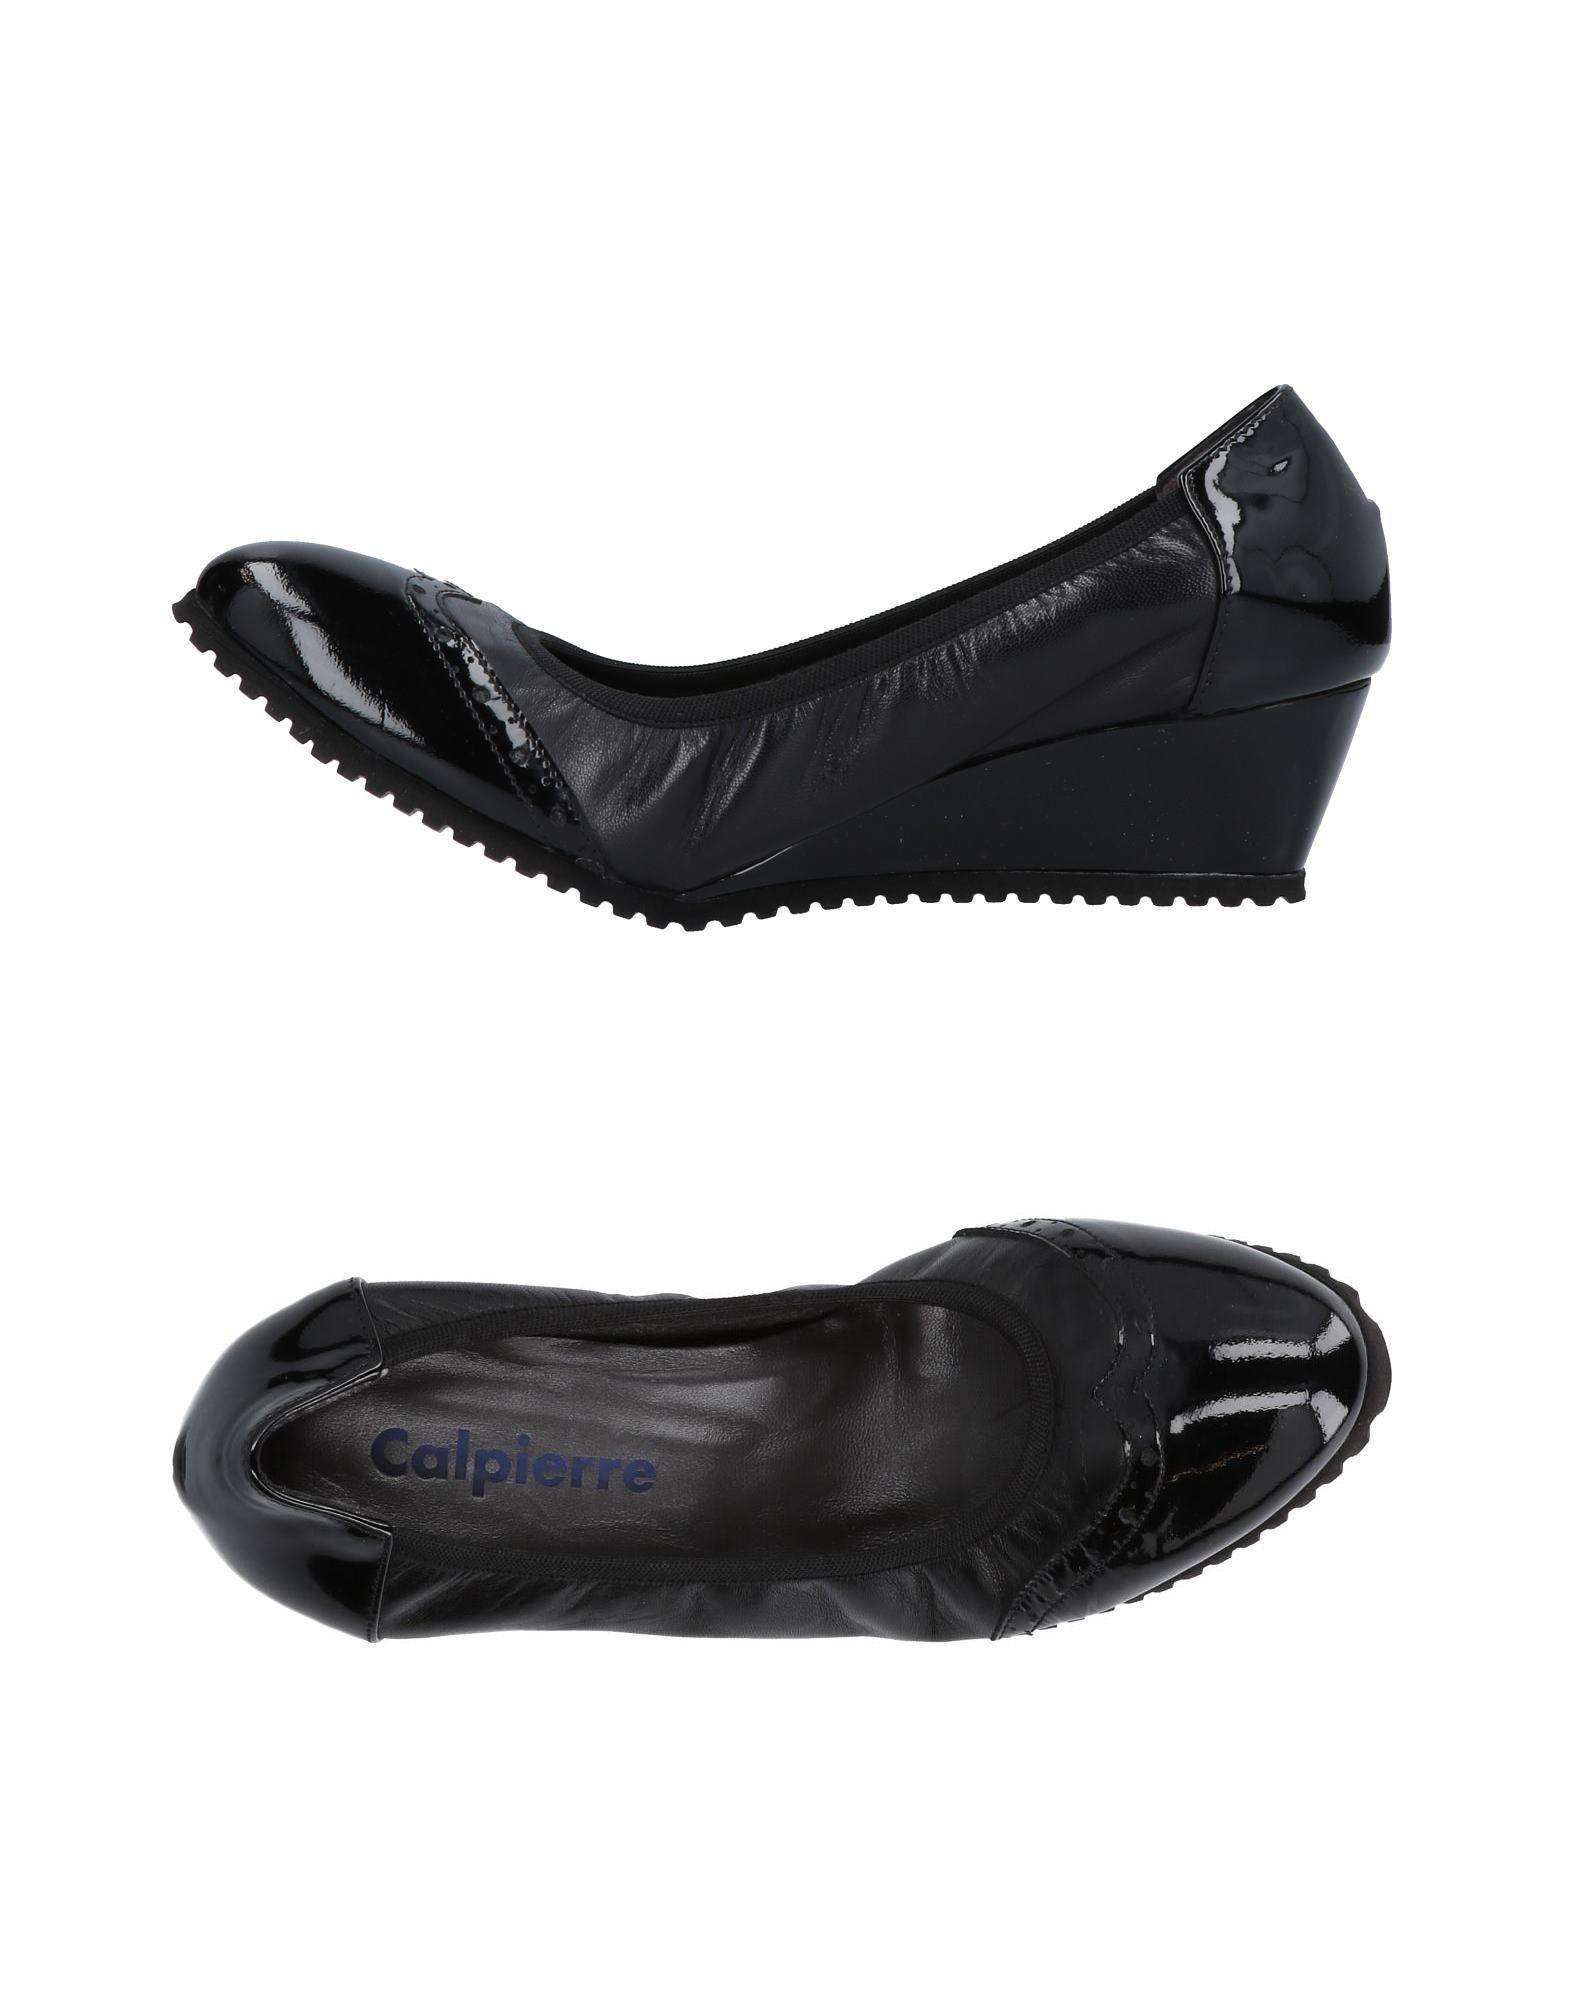 Calpierre Pumps Damen  11458984XD Gute Qualität beliebte Schuhe